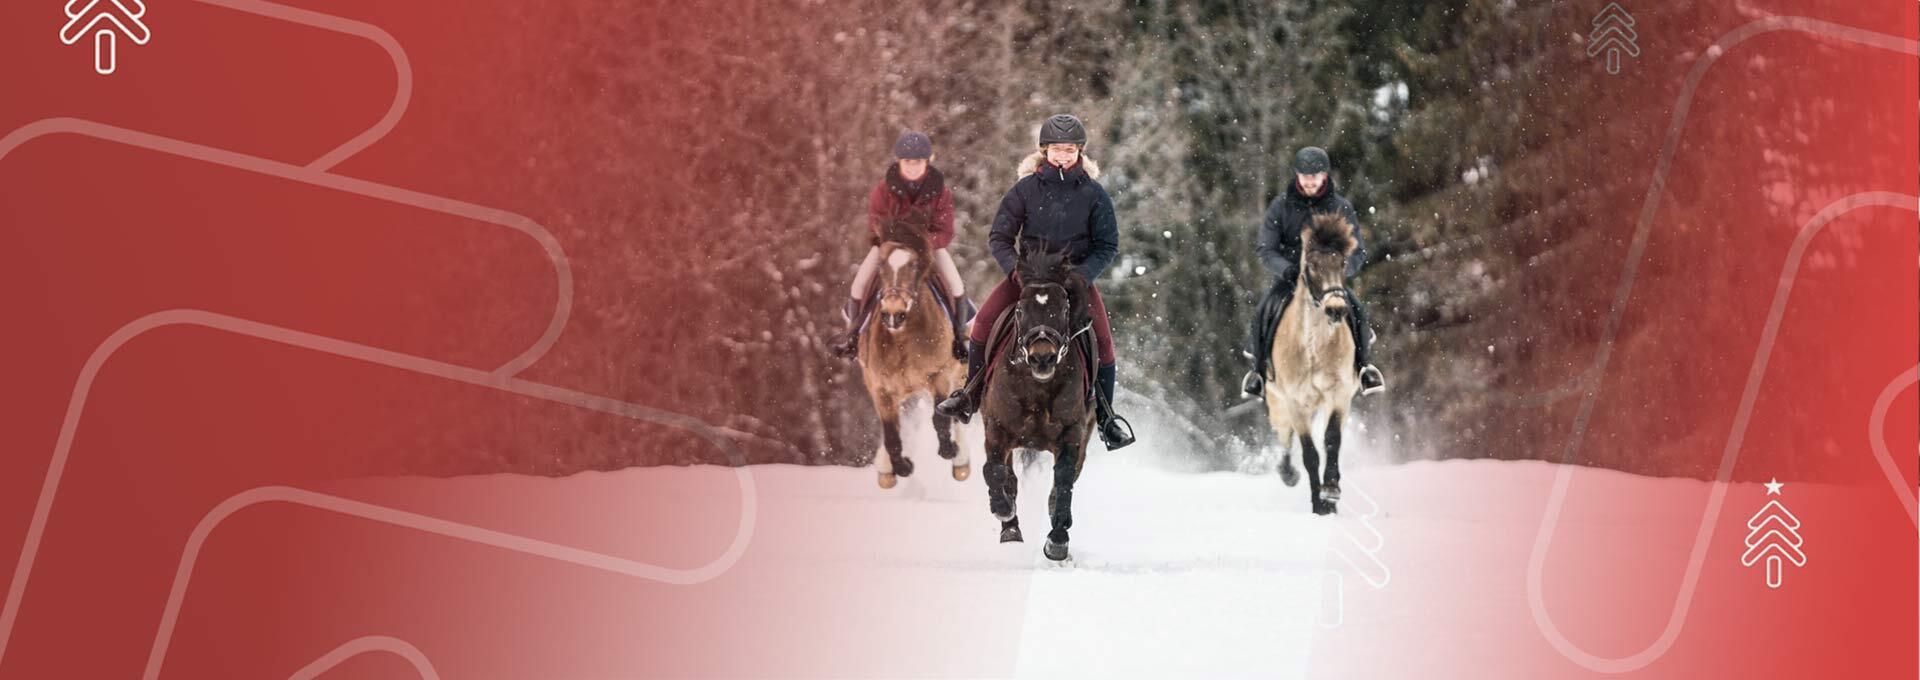 Equitation decathlon noel 2020